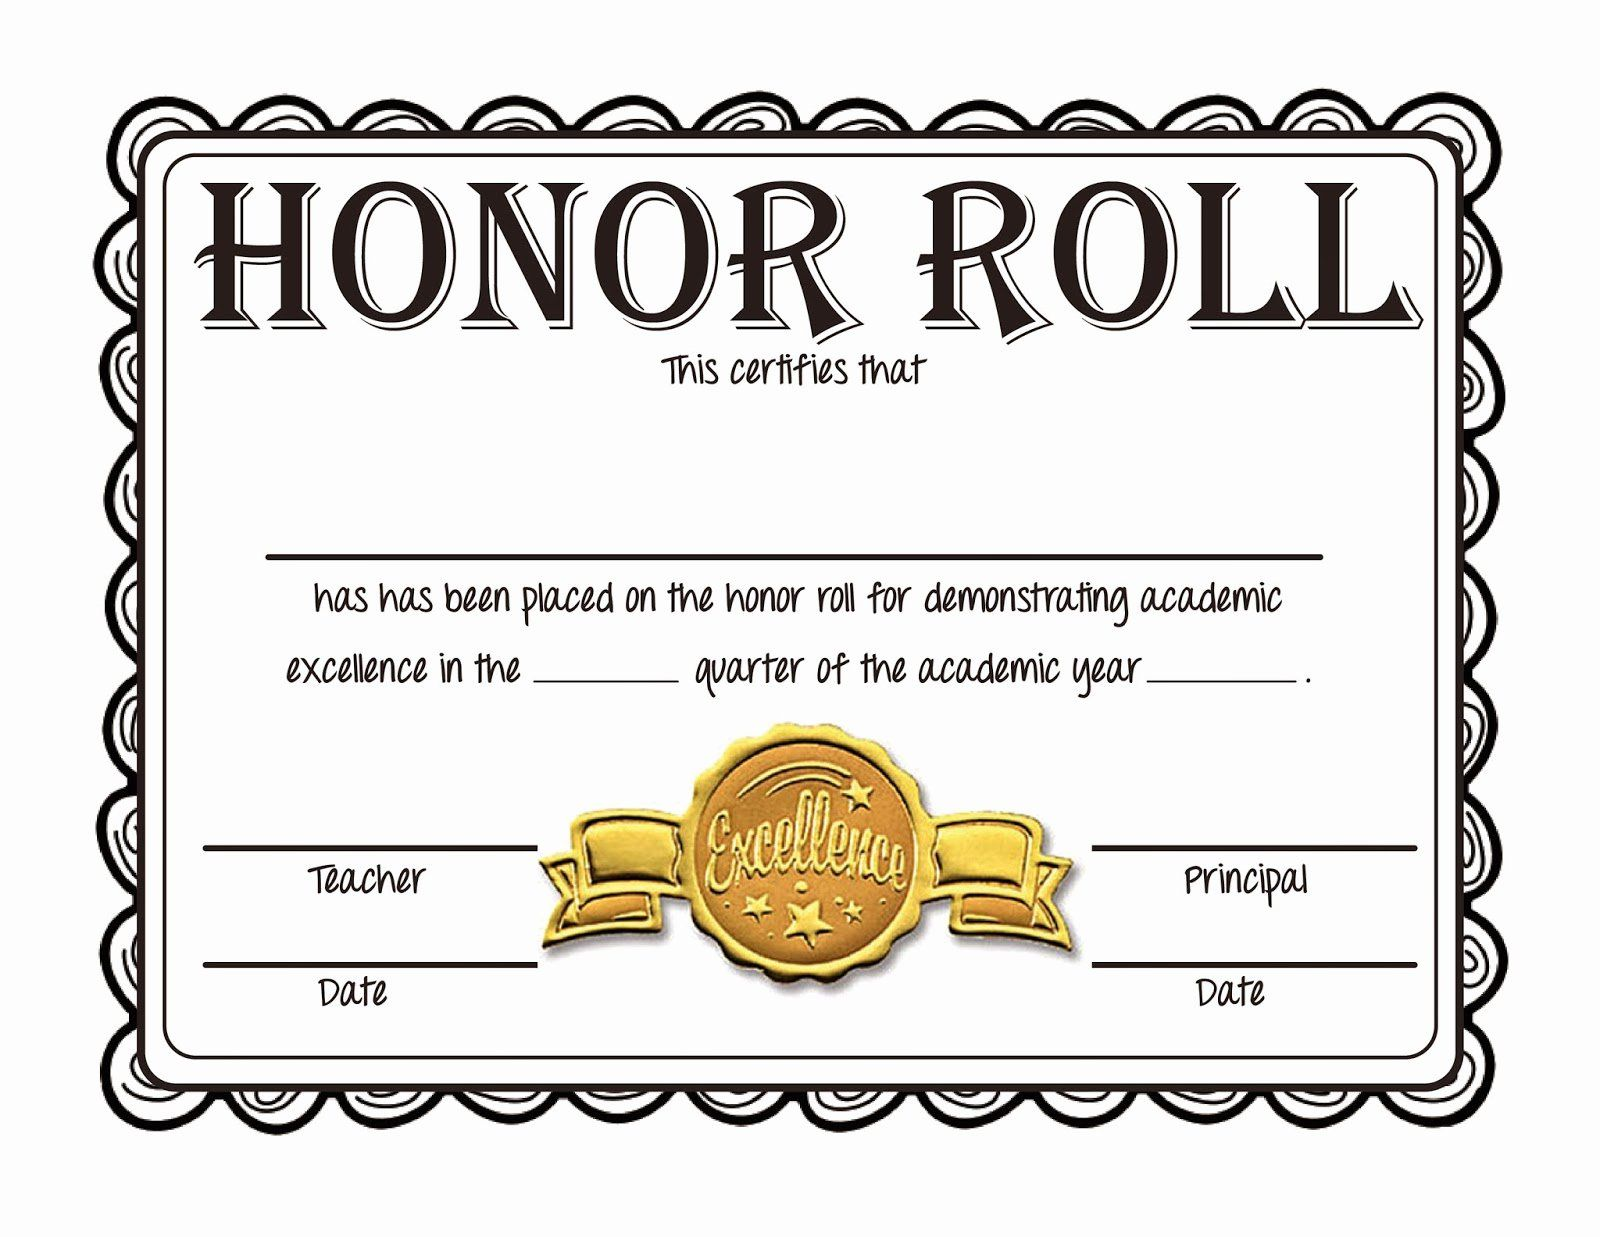 Ab Honor Roll Certificate Template Elegant Steve S Classroom New Freebie Honor Roll Certificates Certificate Templates Honor Roll Awards Certificates Template All a honor roll certificate